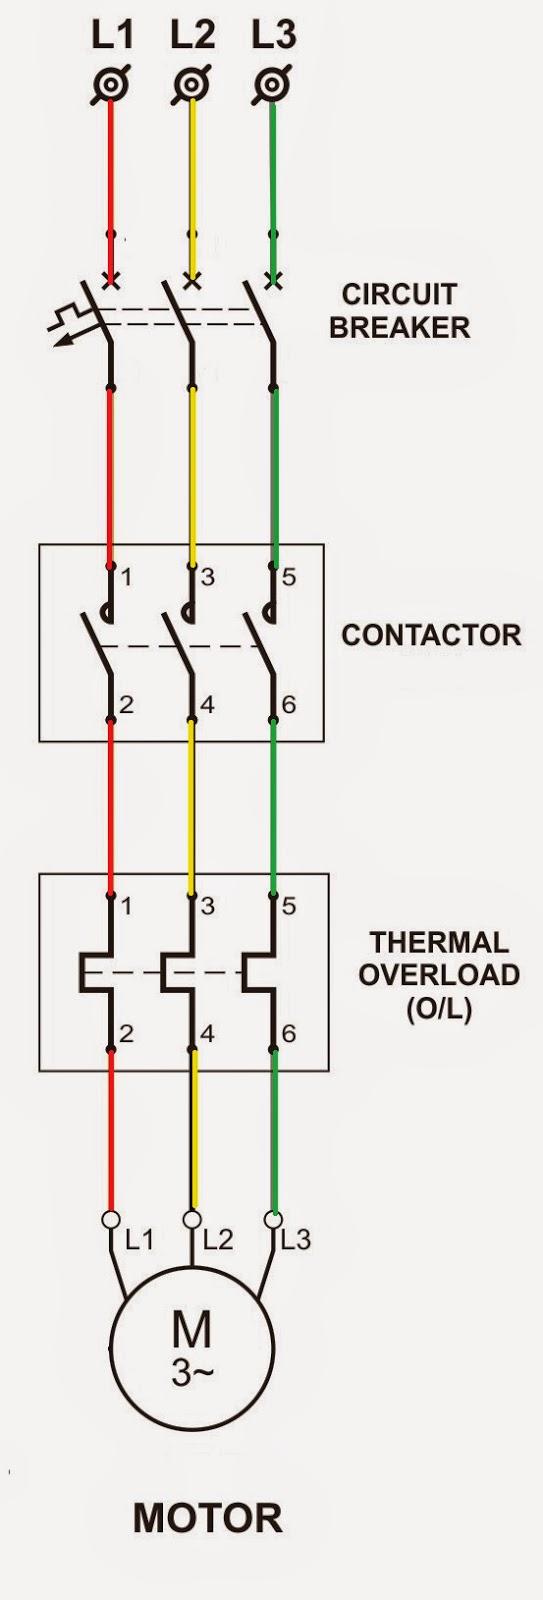 Motor starter wiring automotivegarage electrical standards direct online dol starter asfbconference2016 Choice Image